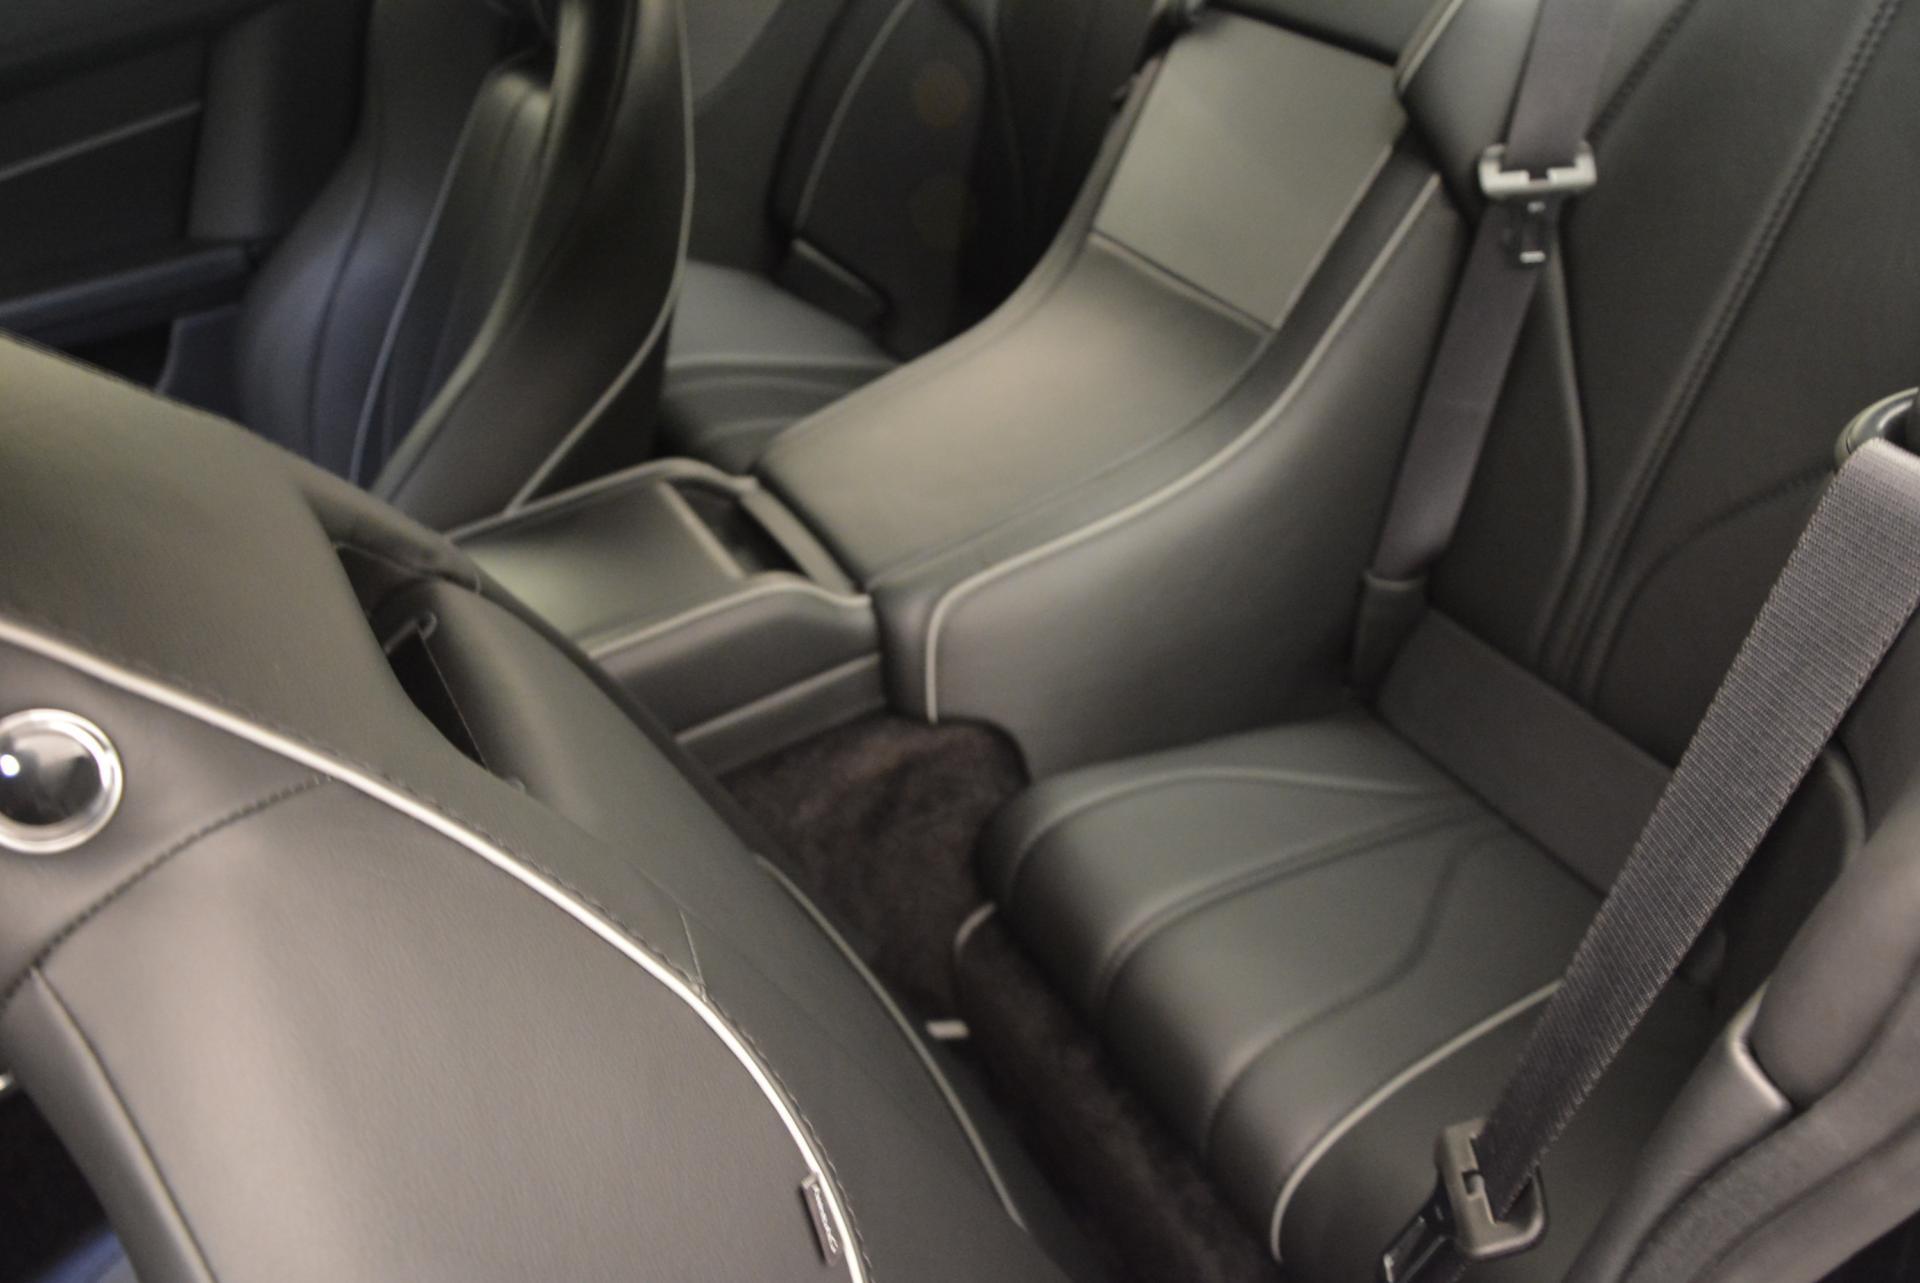 Used 2015 Aston Martin DB9 Carbon Edition For Sale In Greenwich, CT. Alfa Romeo of Greenwich, 7349 528_p19